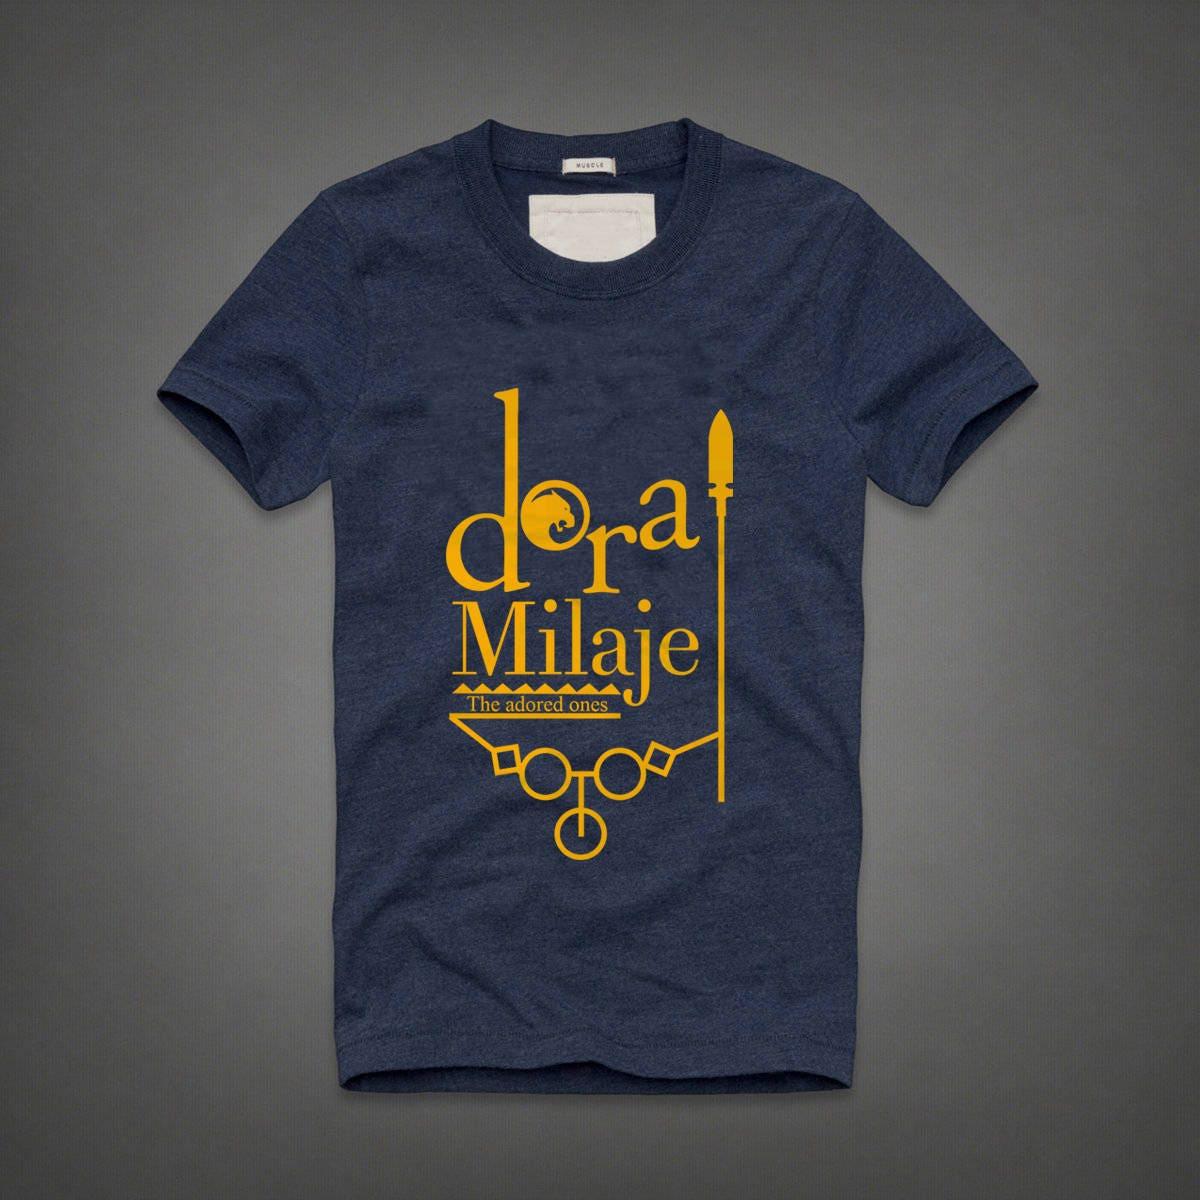 24e1076c4edeb Dora Milaje - Black Panther ADULT T-shirt